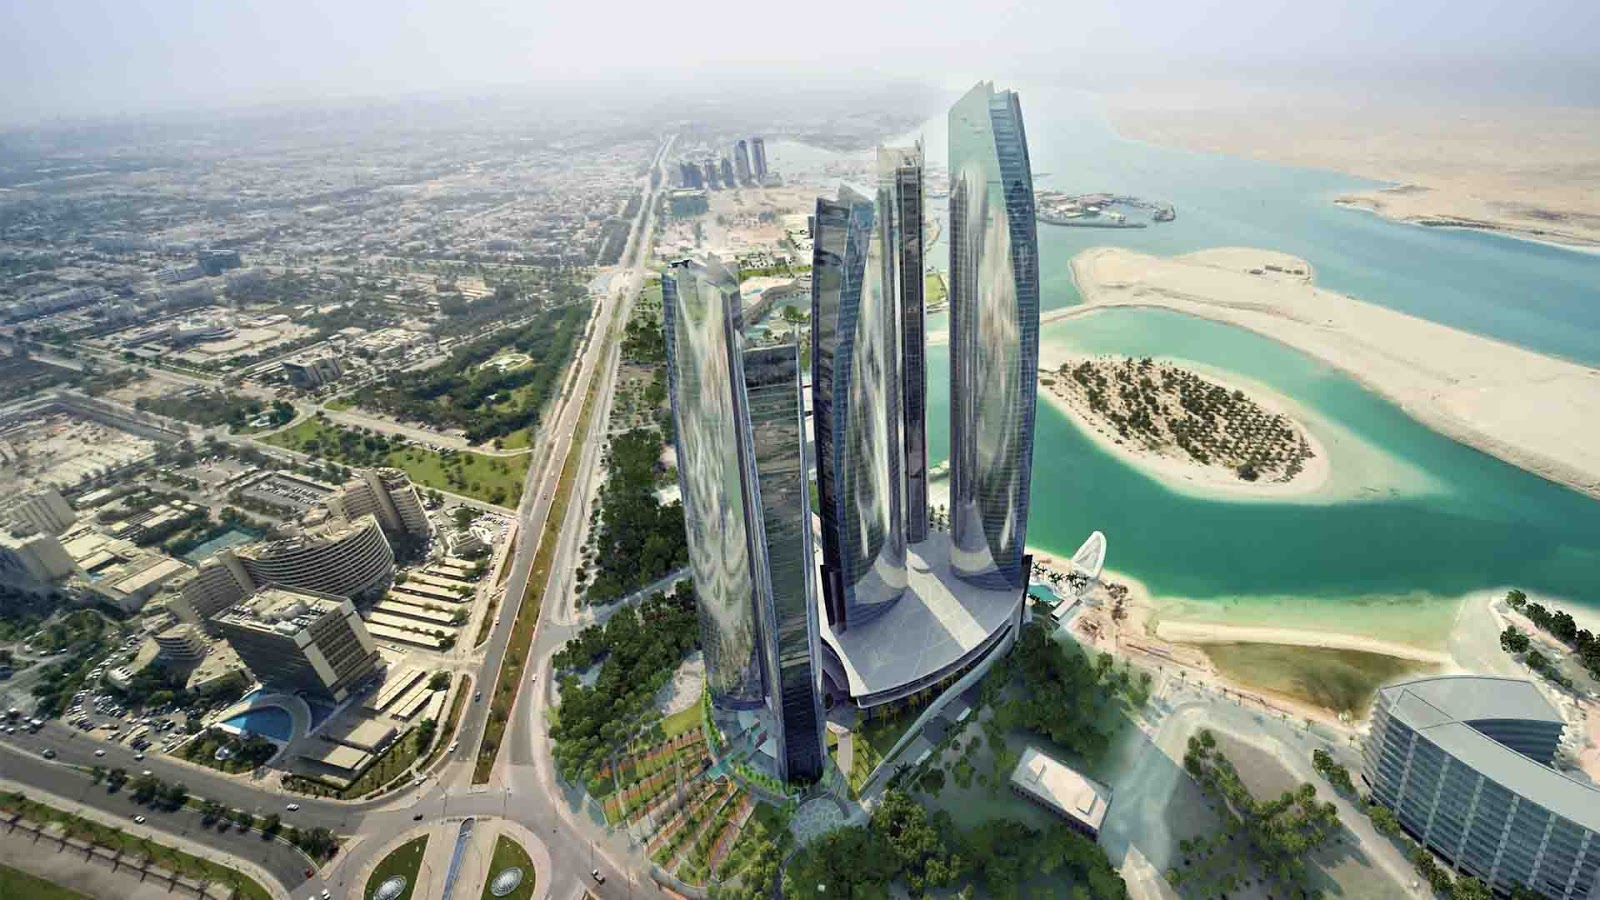 THE PALACE AT ONE&ONLY ROYAL MIRAGE DUBAI - TripAdvisor